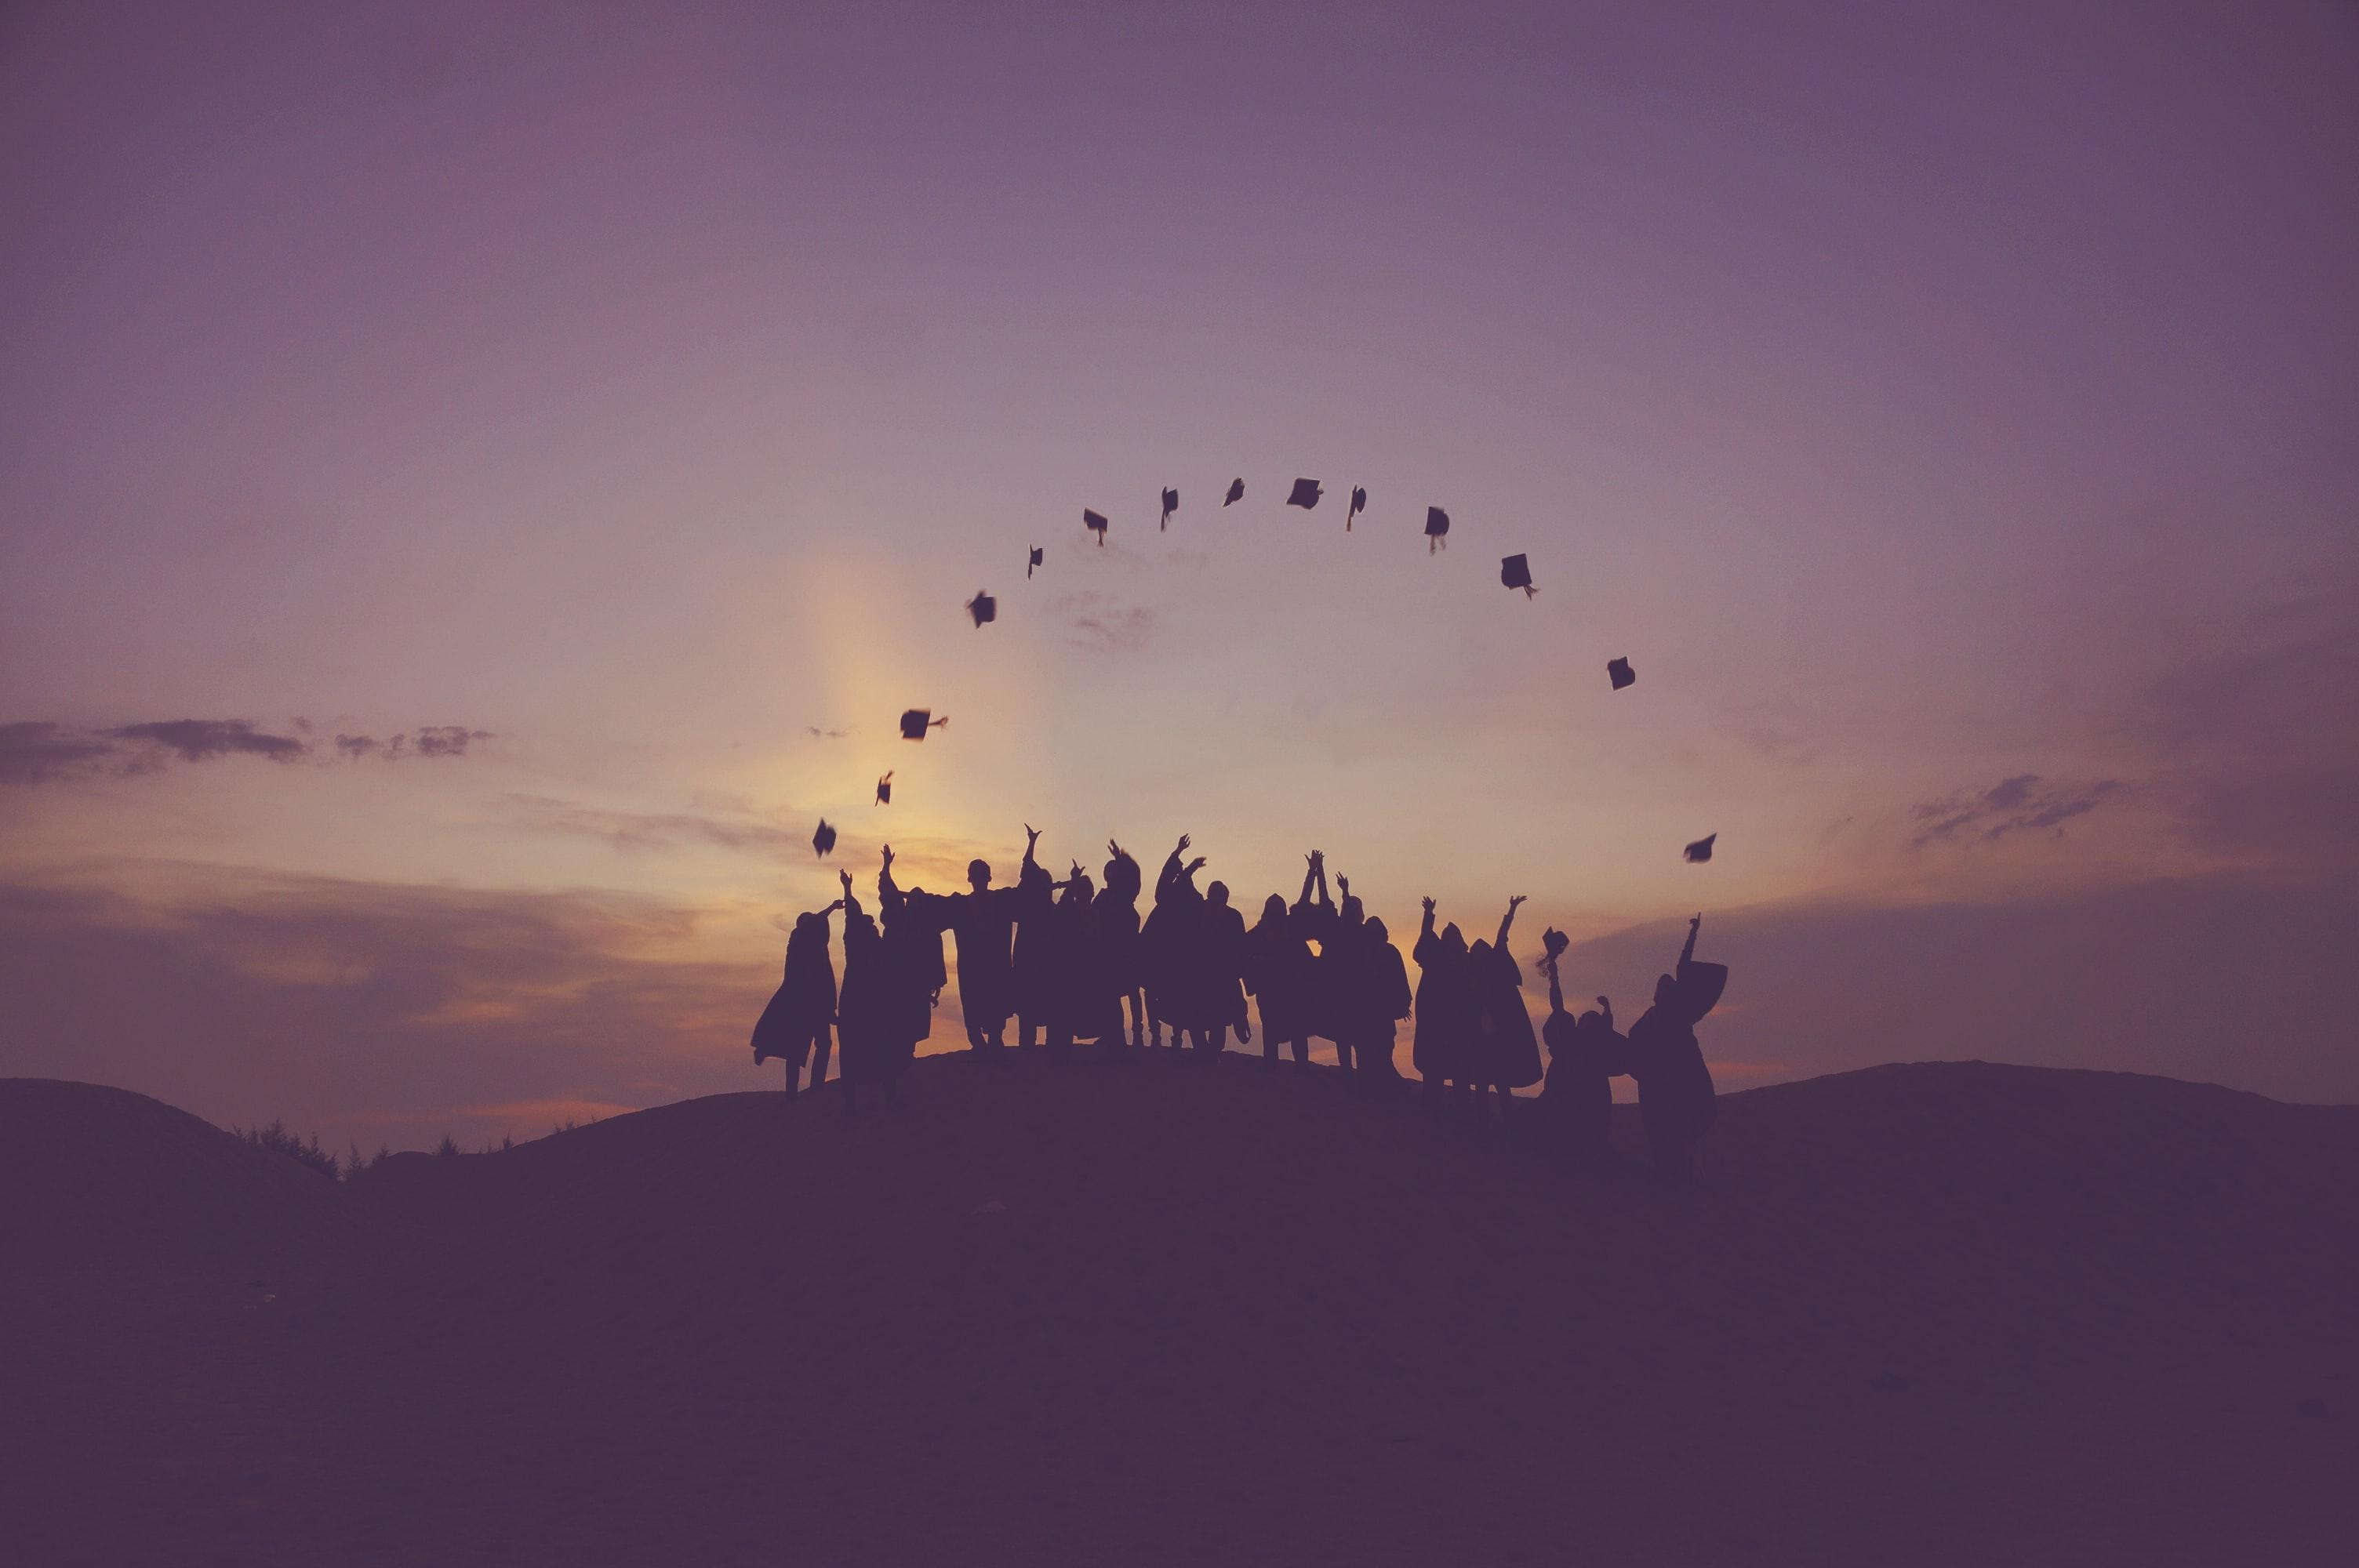 Graduates throw their caps in the air. Photo courtesy of Baim Hanif on Unsplash.